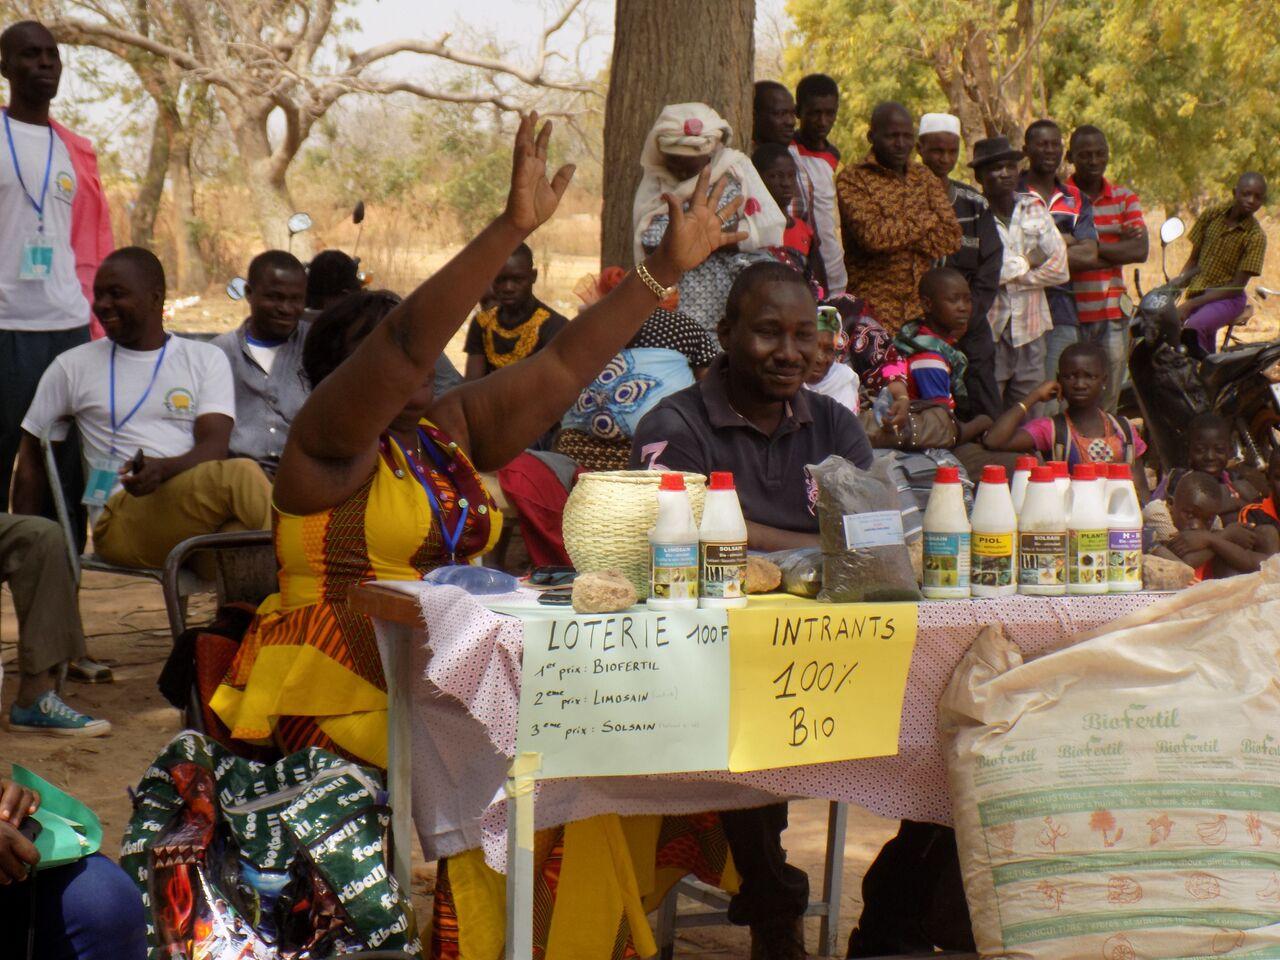 Centro_Agricolo2_Burkina_Faso_Mani_Tese_2017.png